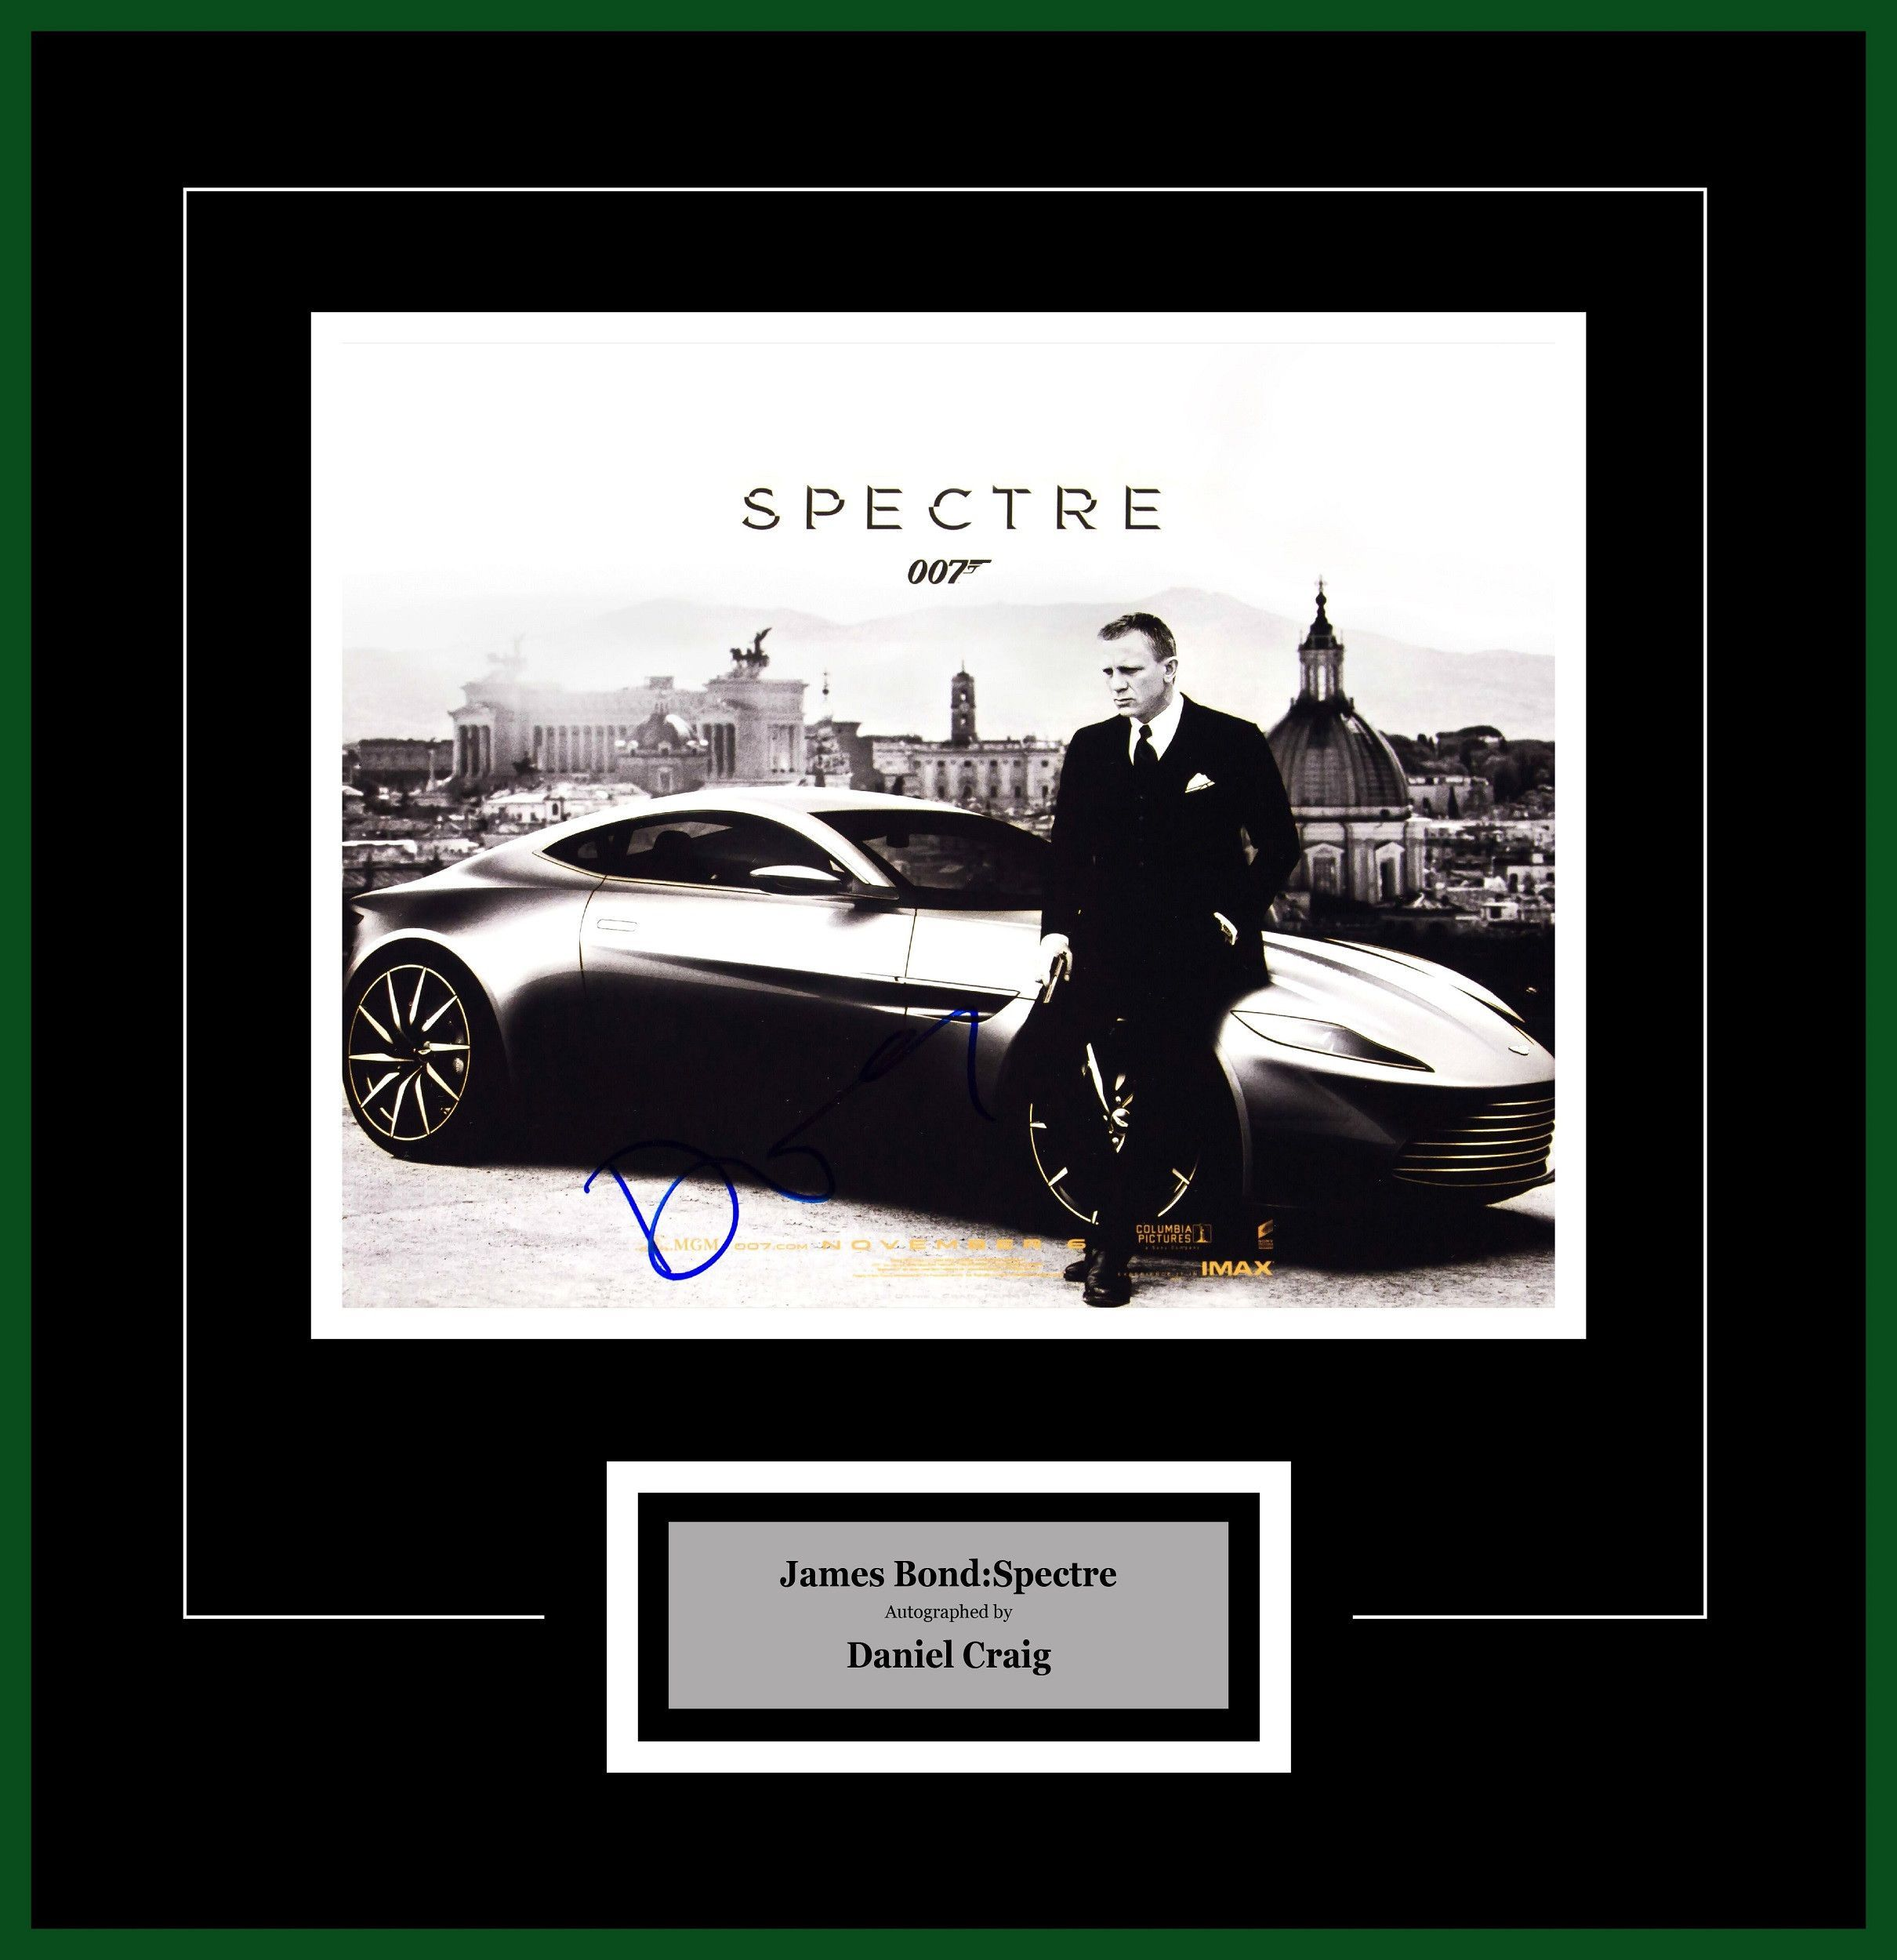 James Bond Spectre- Signed by Daniel Craig - Framed Artist Series